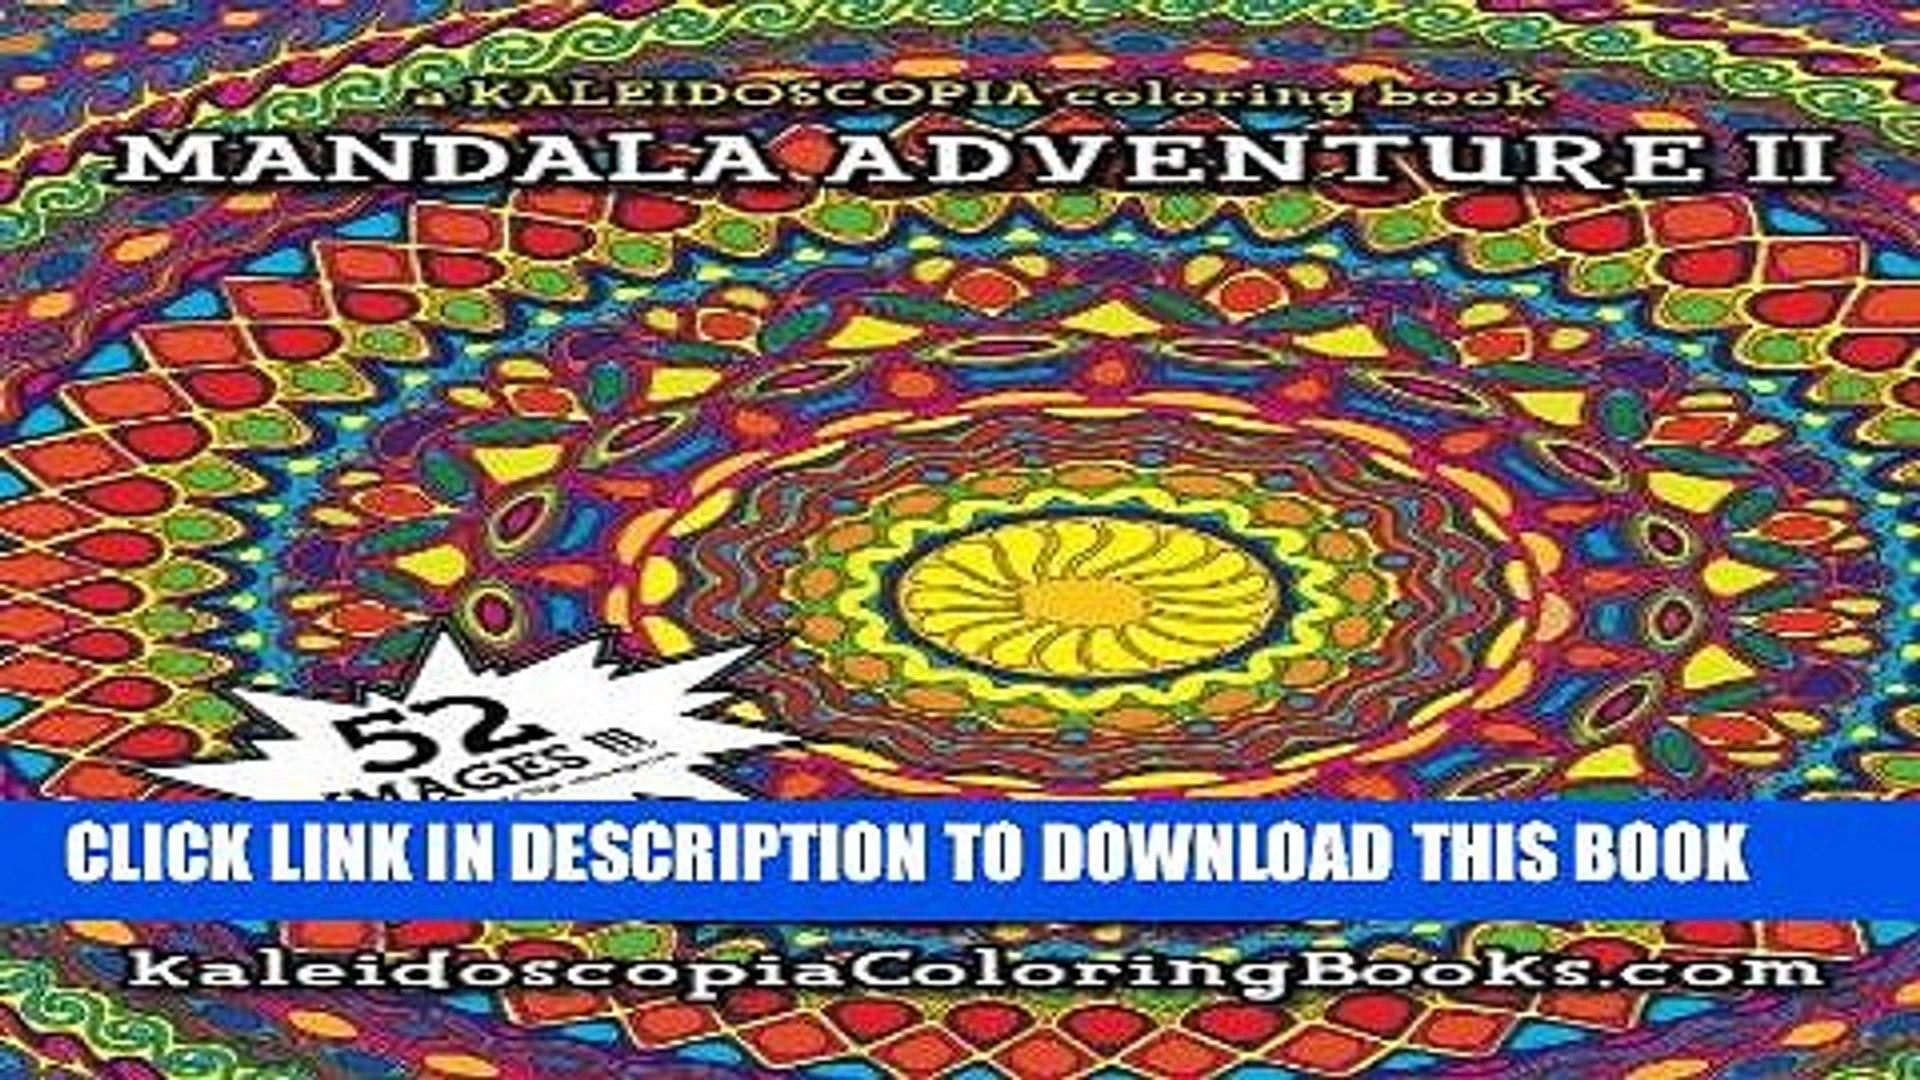 Ebook Mandala Adventure II: A Kaleidoscopia Coloring Book ...